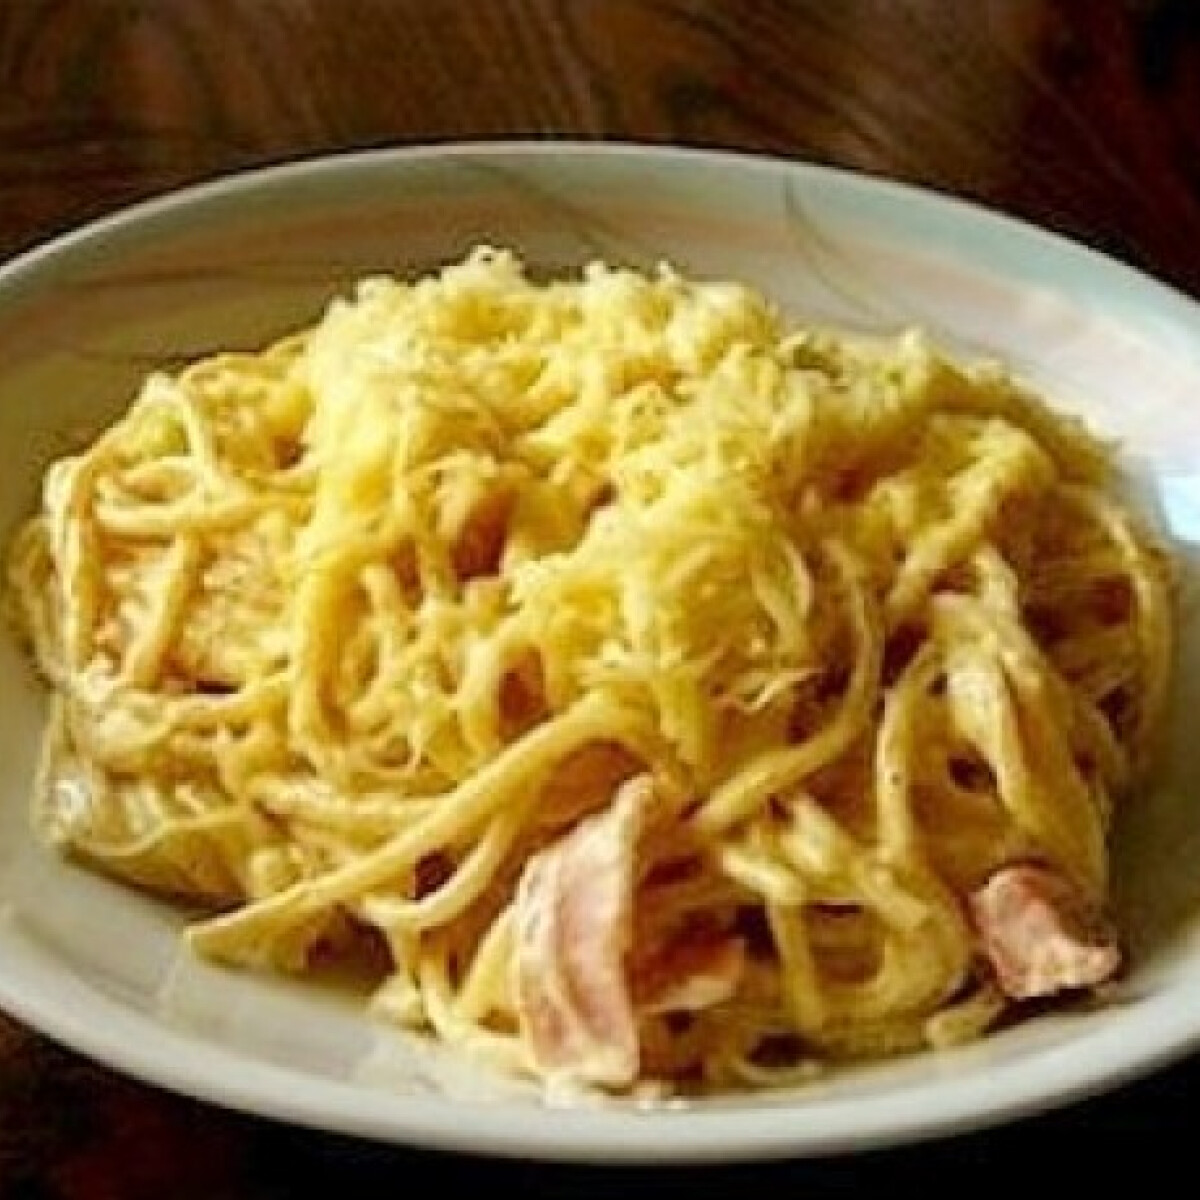 Ezen a képen: Spagetti carbonara 5.